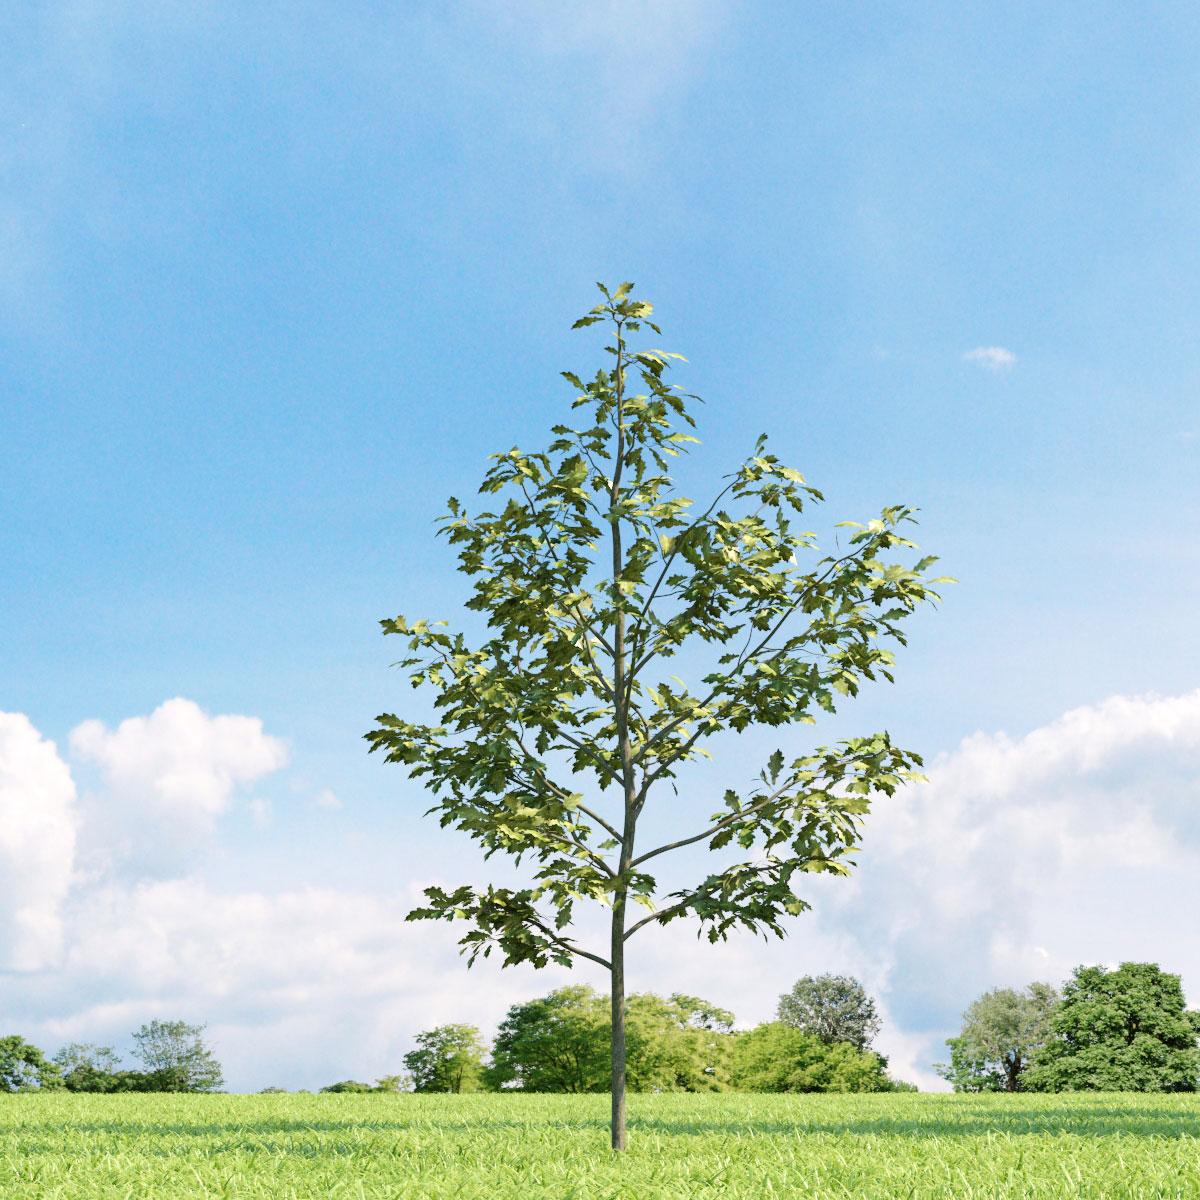 Quercus shumardii 19 v1 AM136 Archmodels